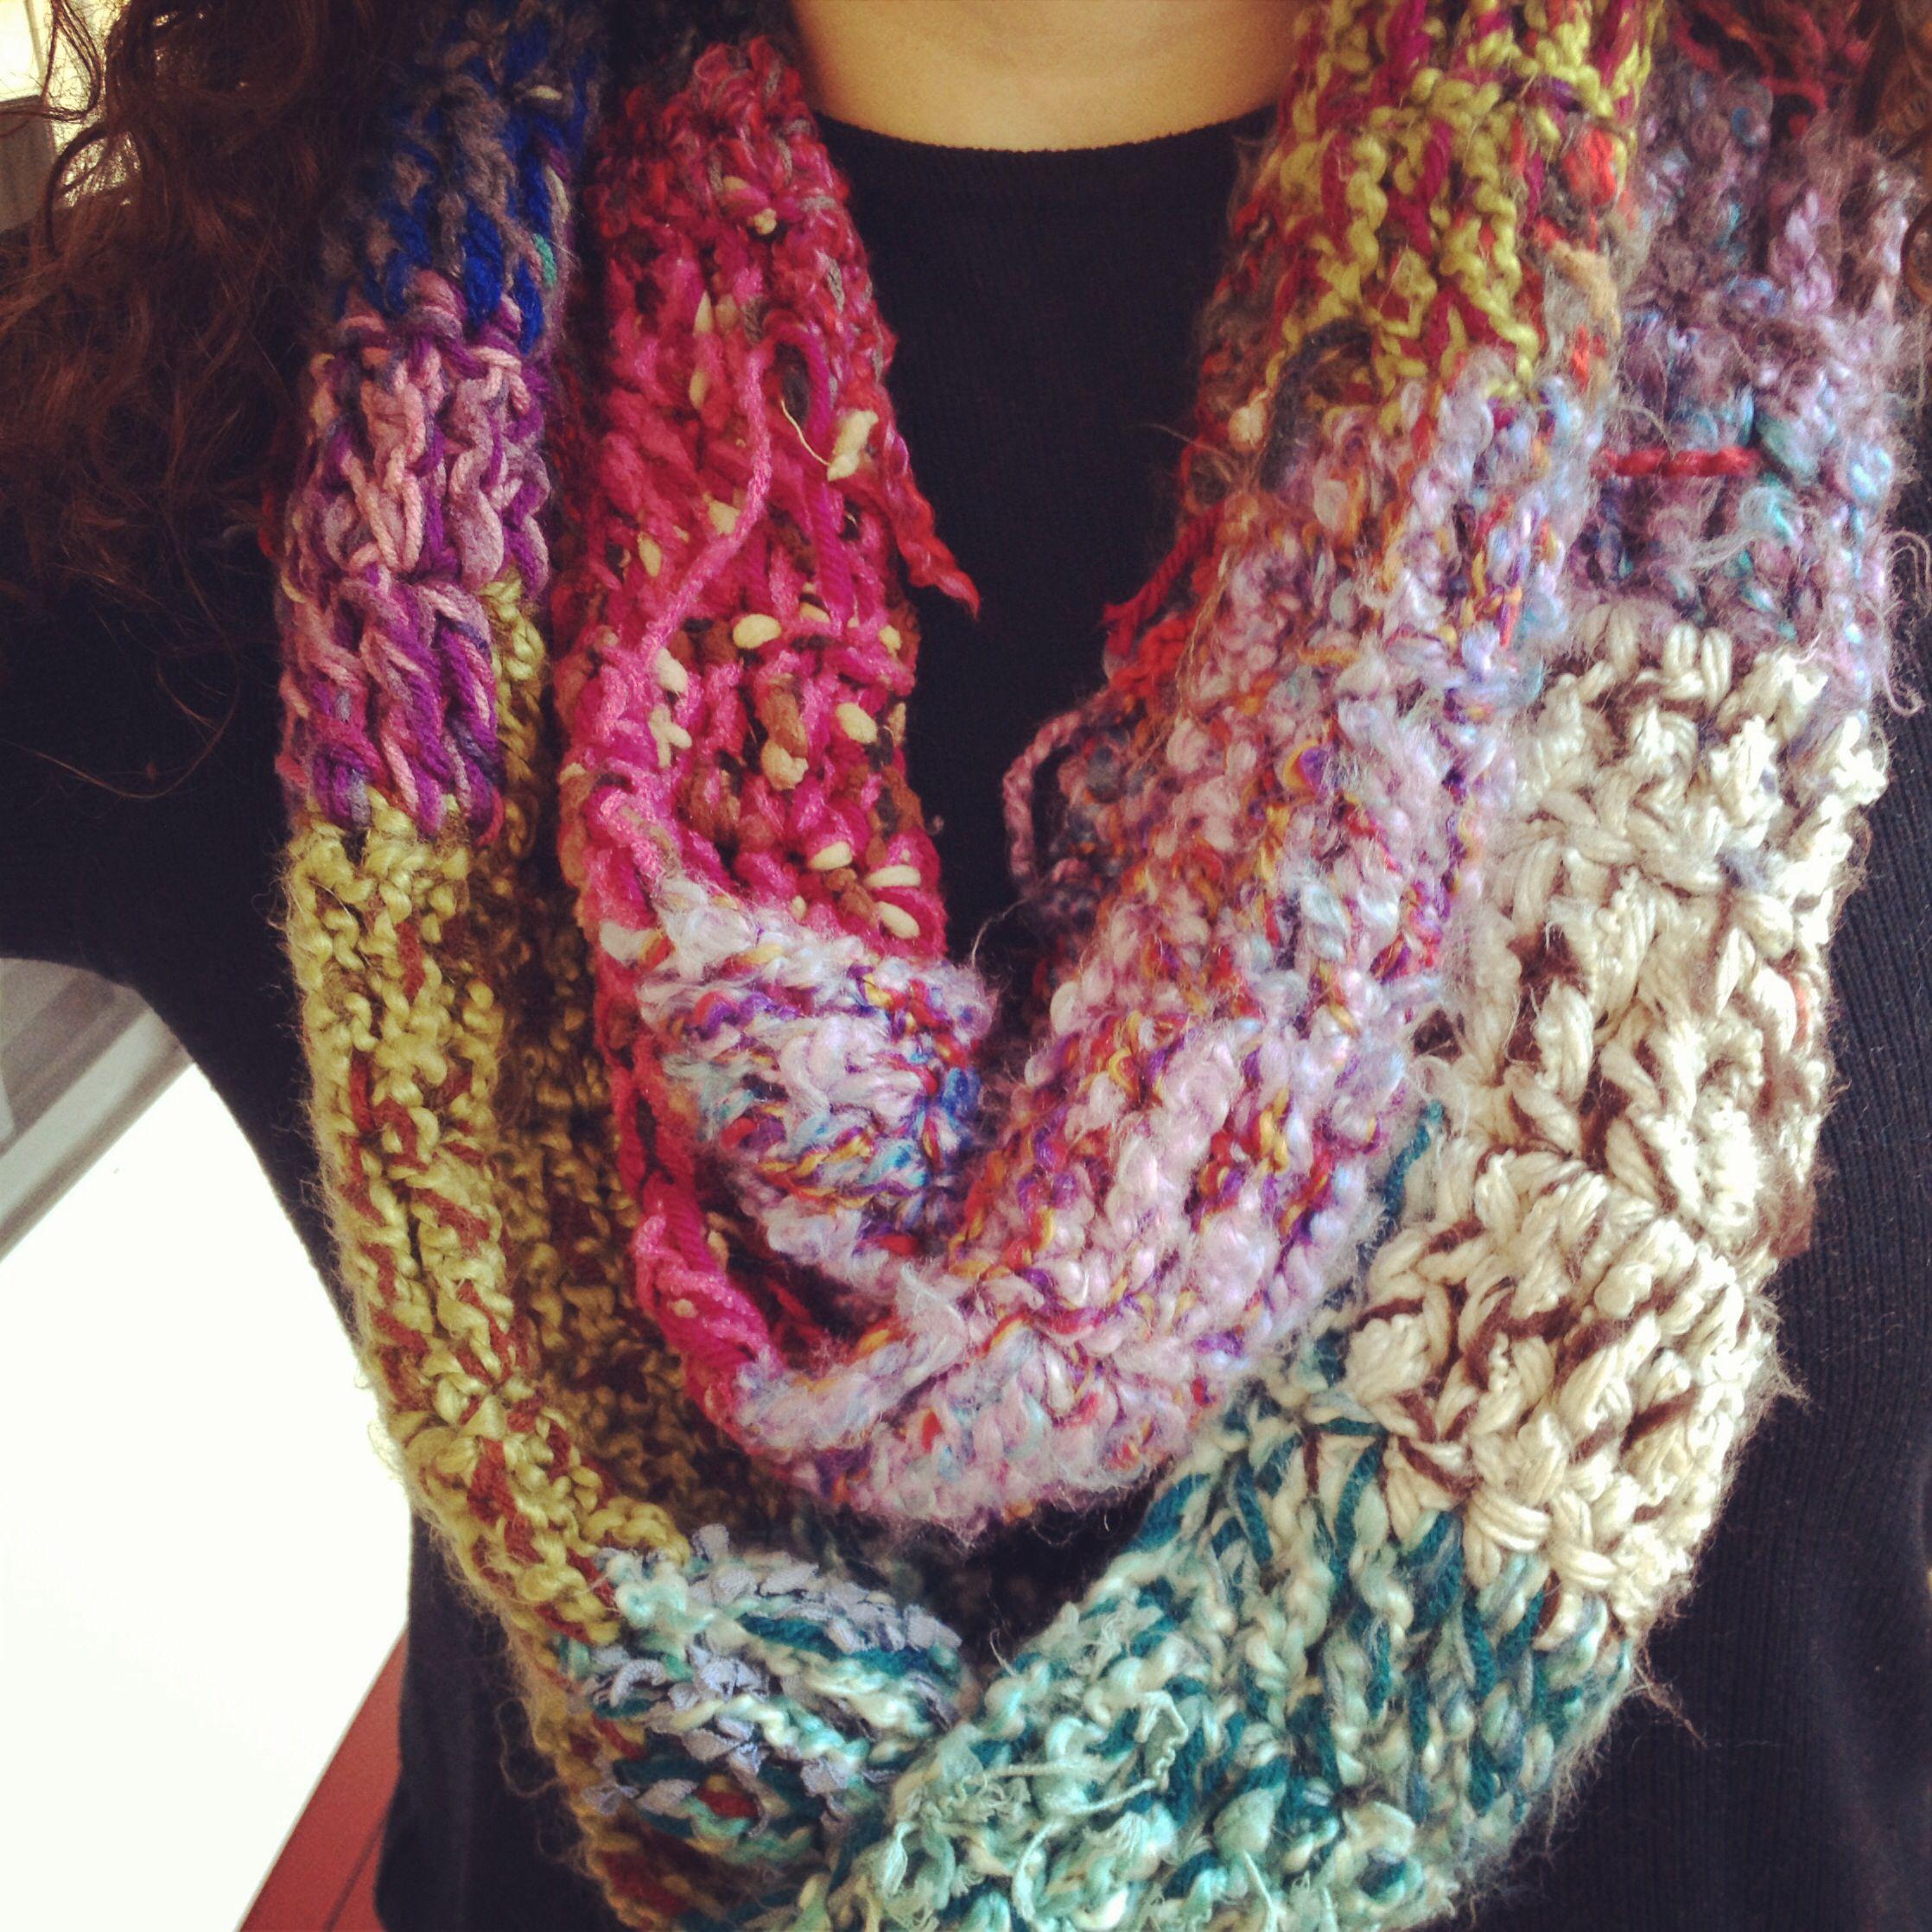 Crocheting Infinity Scarf : Crochet infinity scarf. Crochet Pinterest